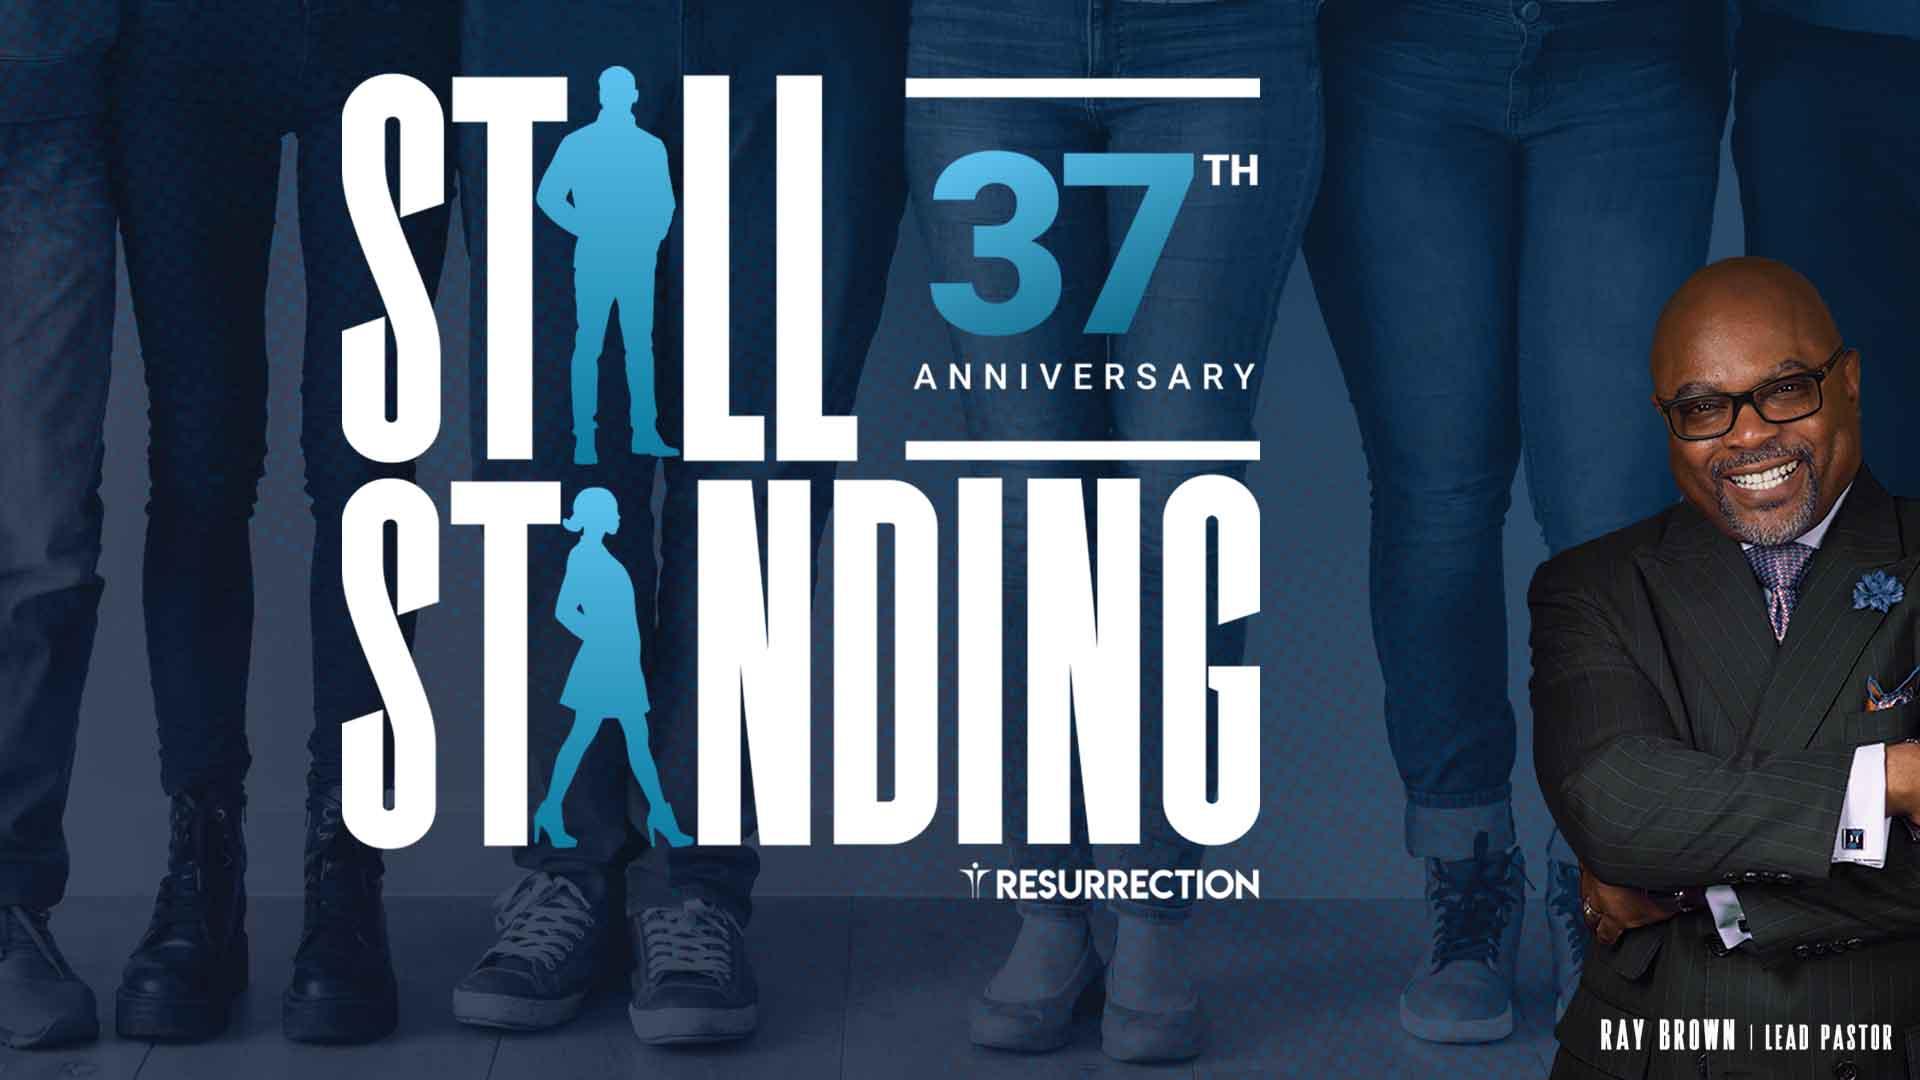 STILL STANDING_1920x1080